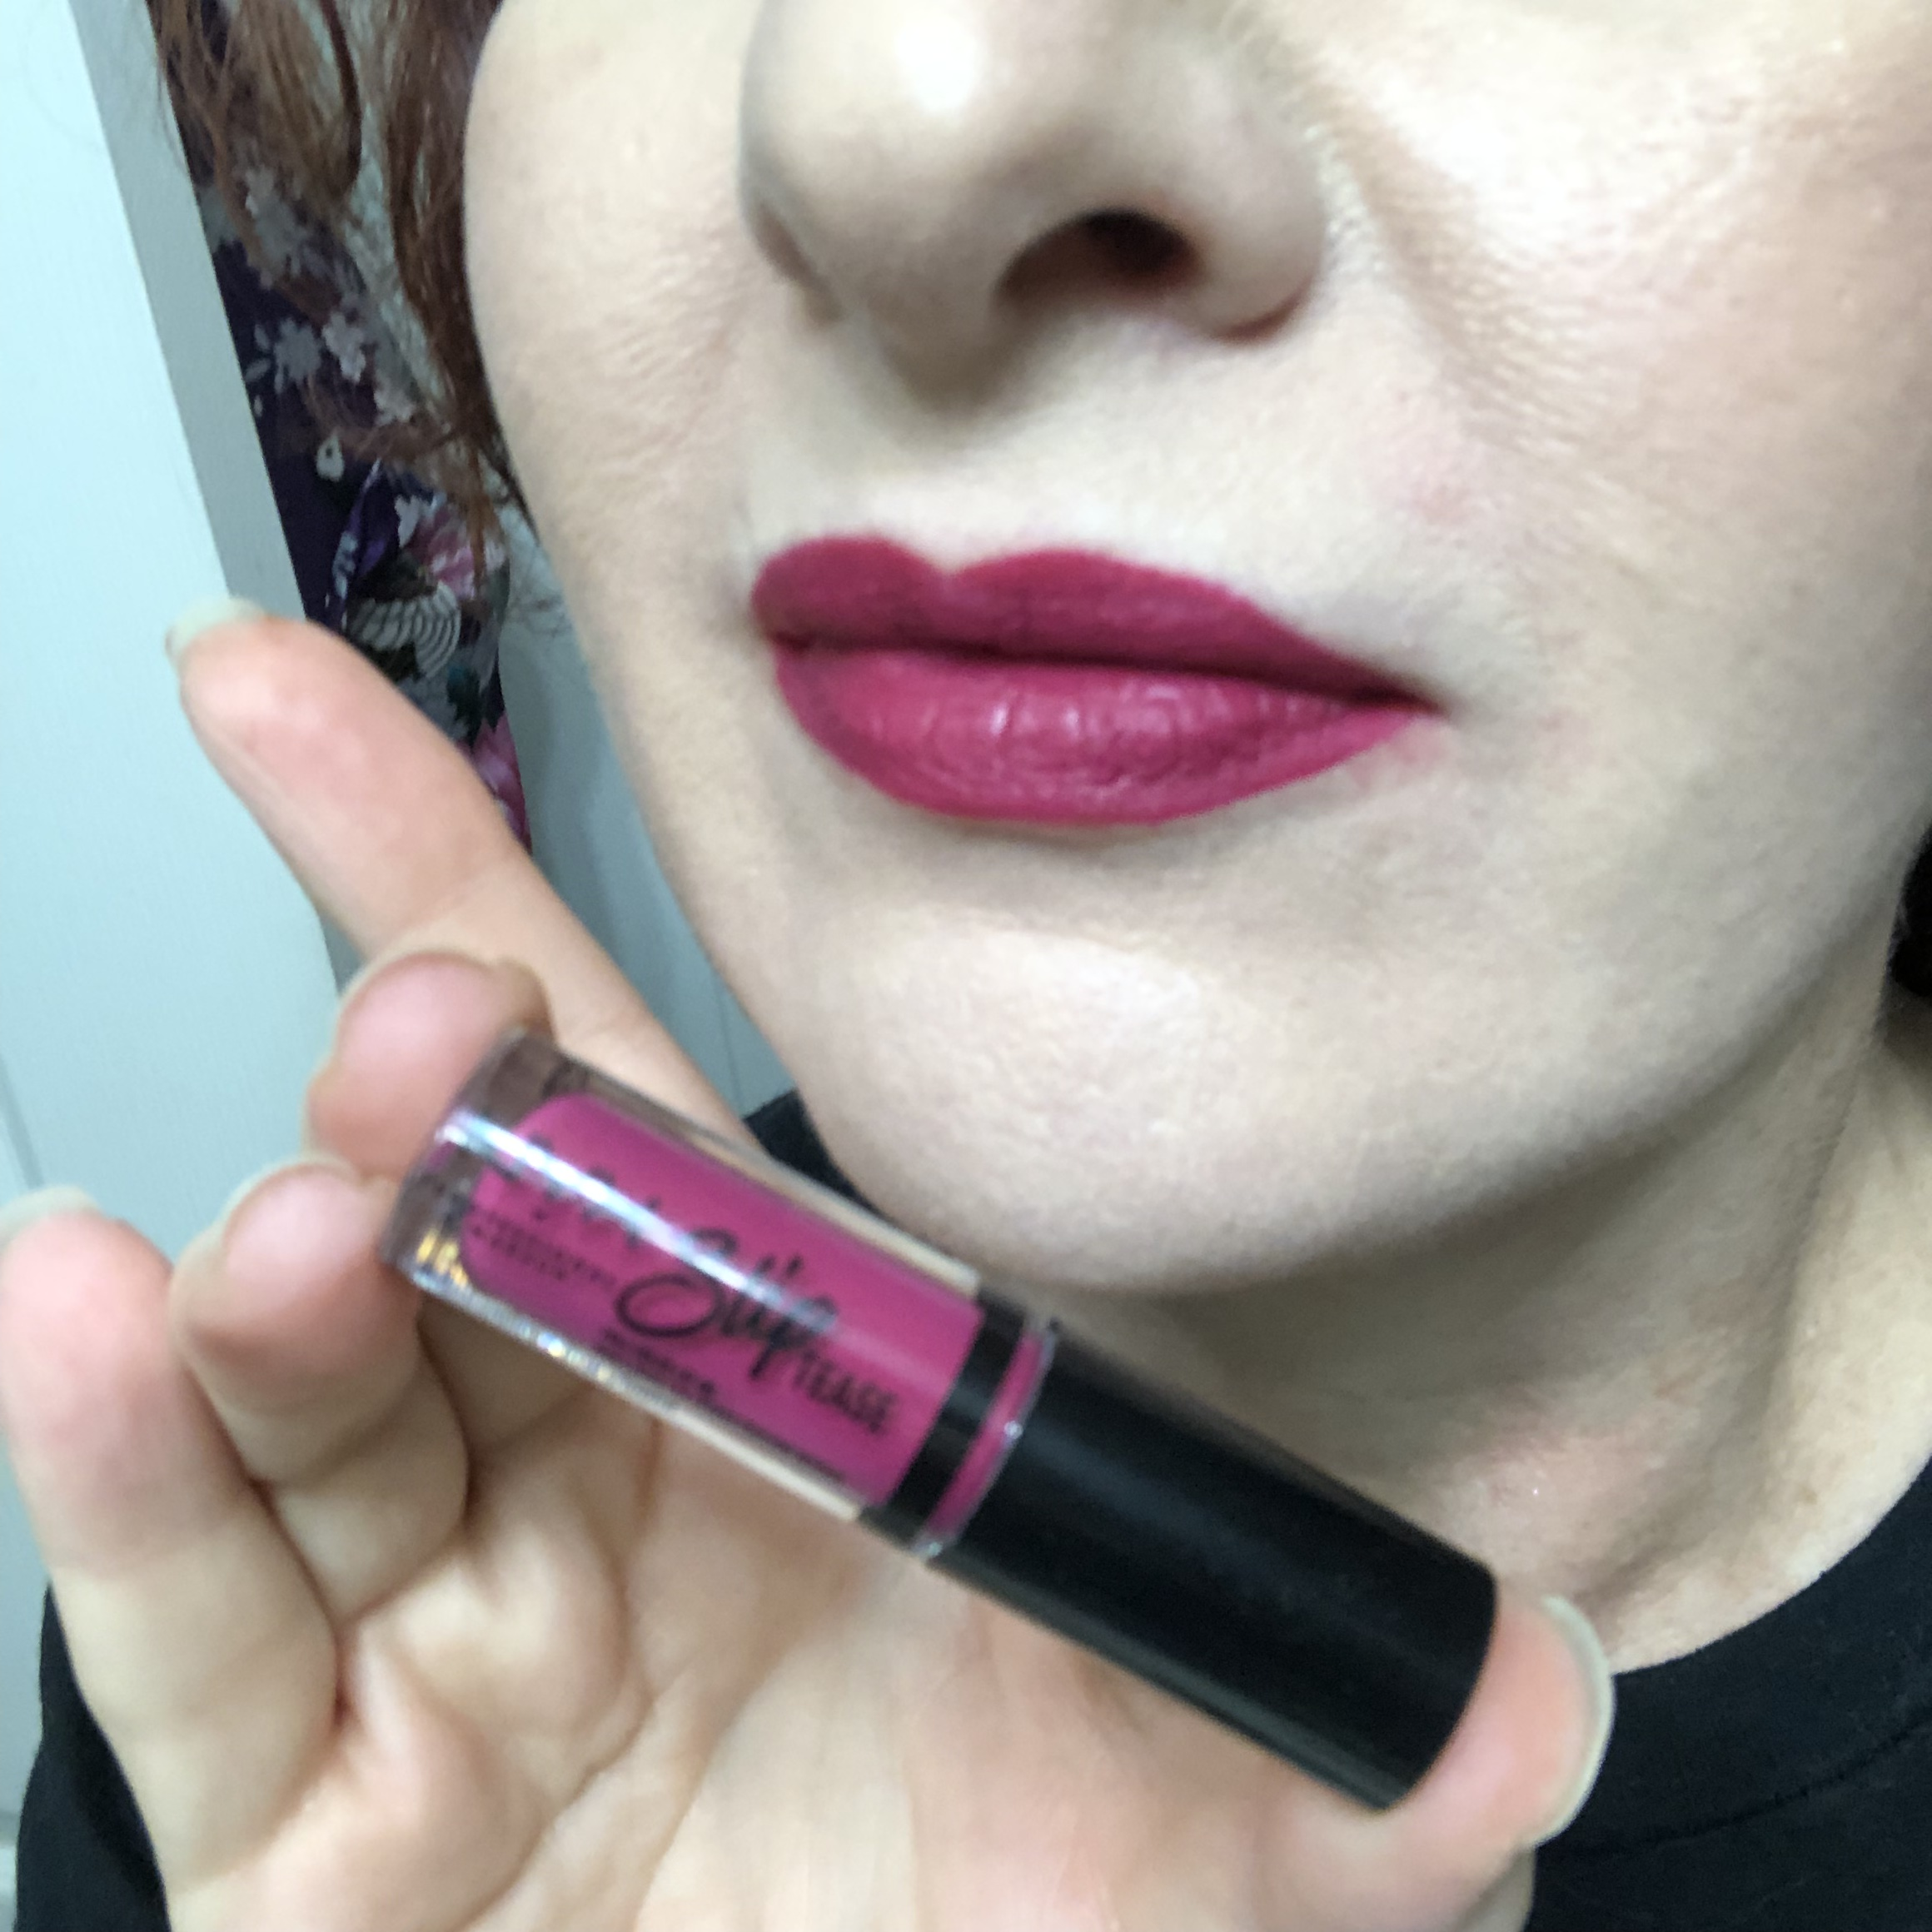 Nyx Sweet Chateau Slip Tease Lip Vault Sugar Overload Swatch